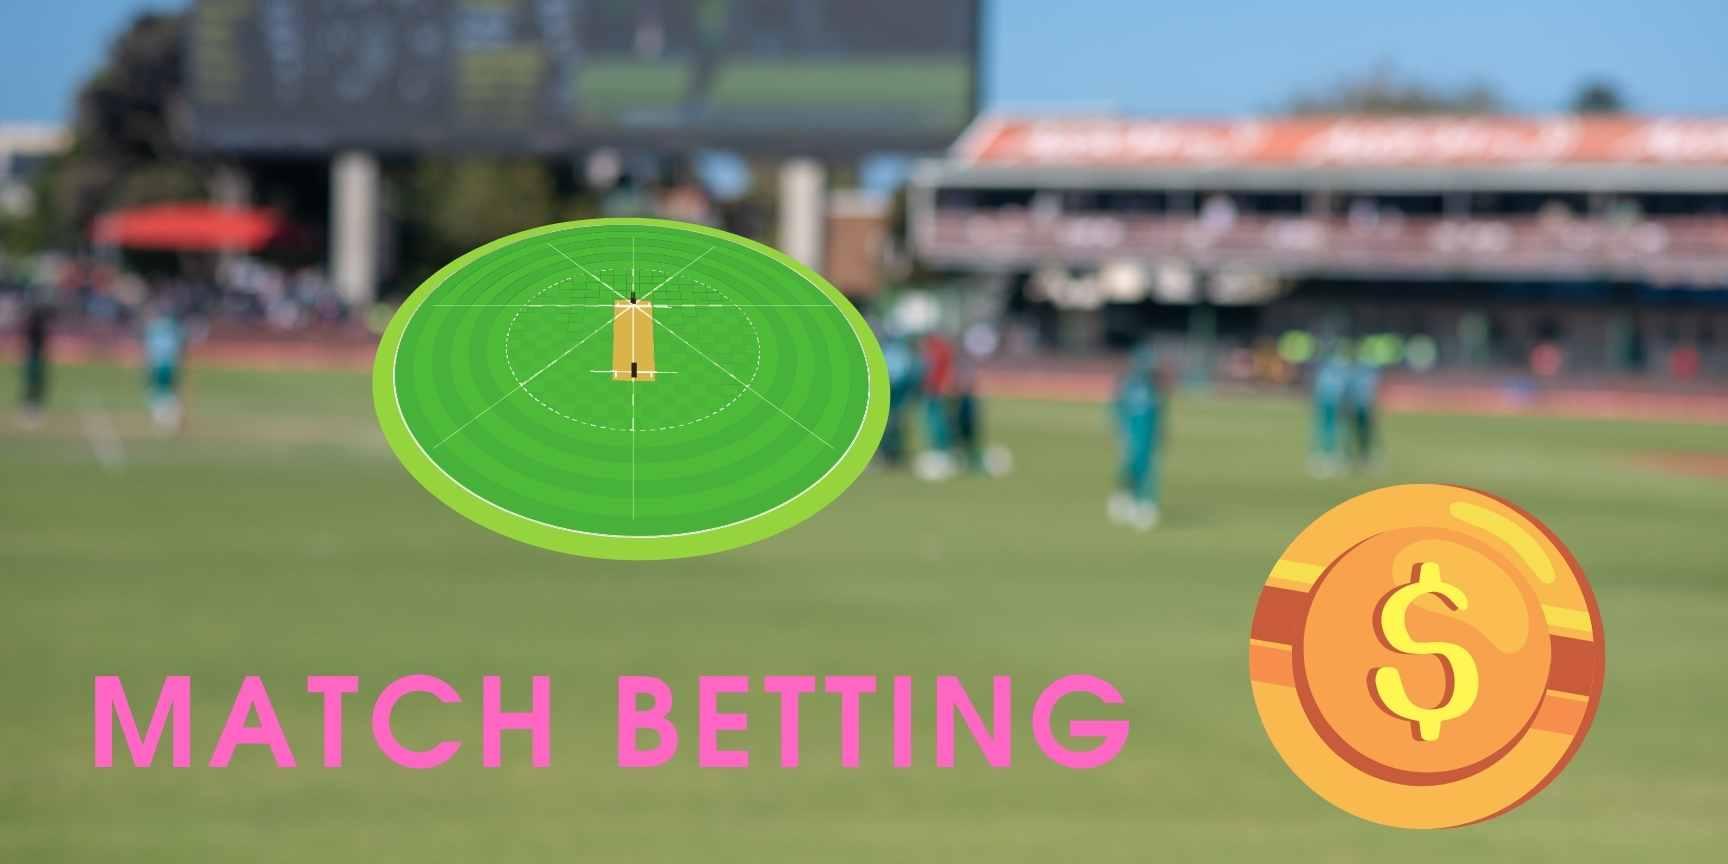 cricket match betting